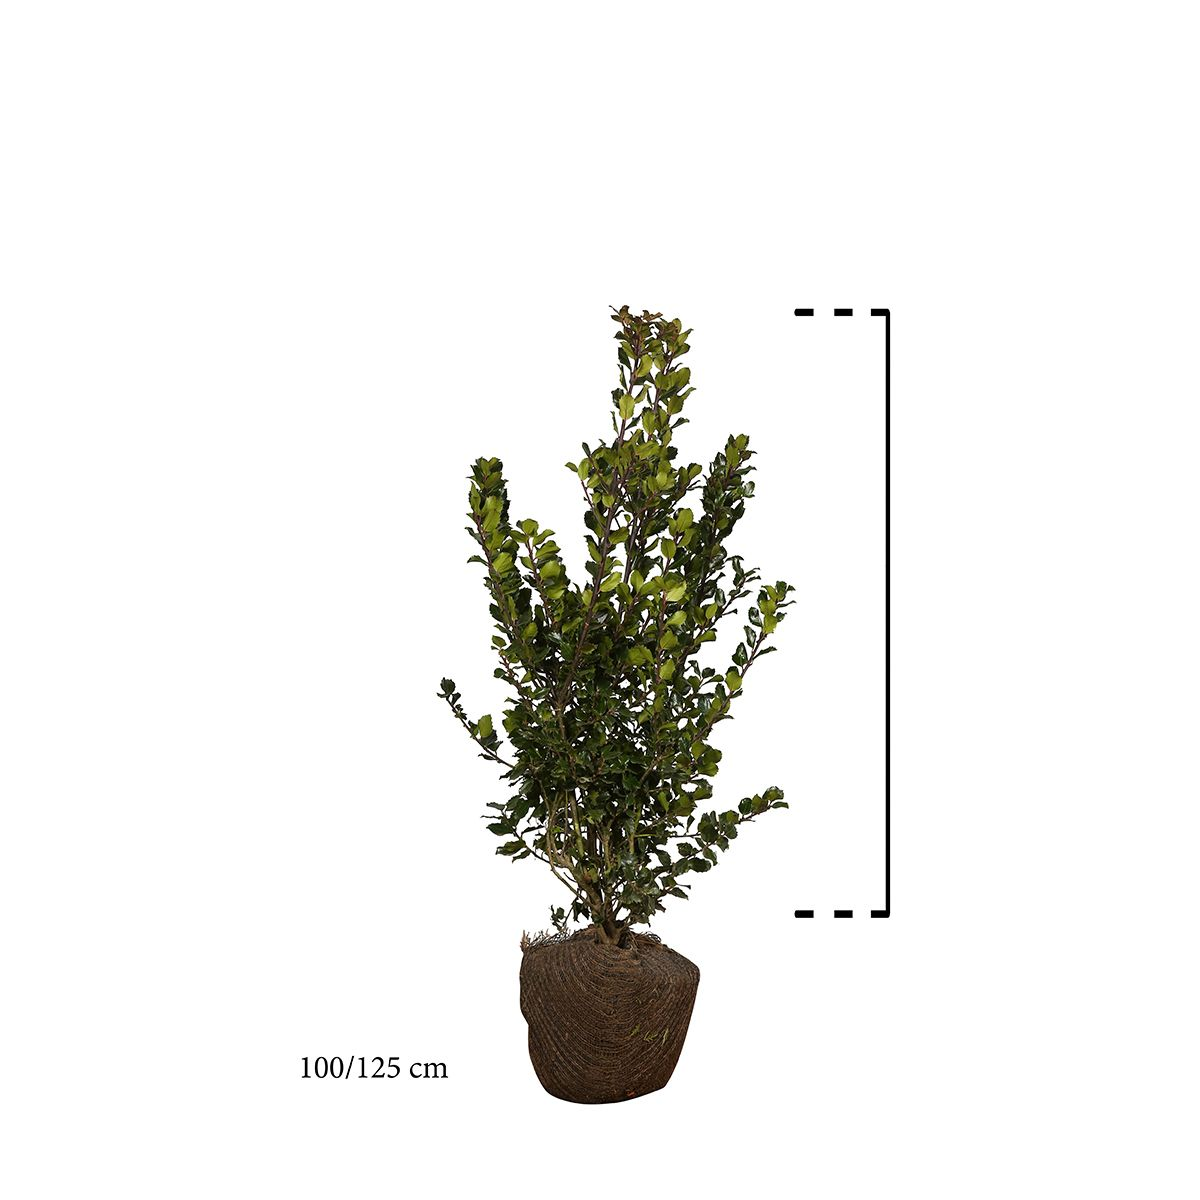 Stechpalme 'Blue Prince' Wurzelballen 100-125 cm Extra Qualtität